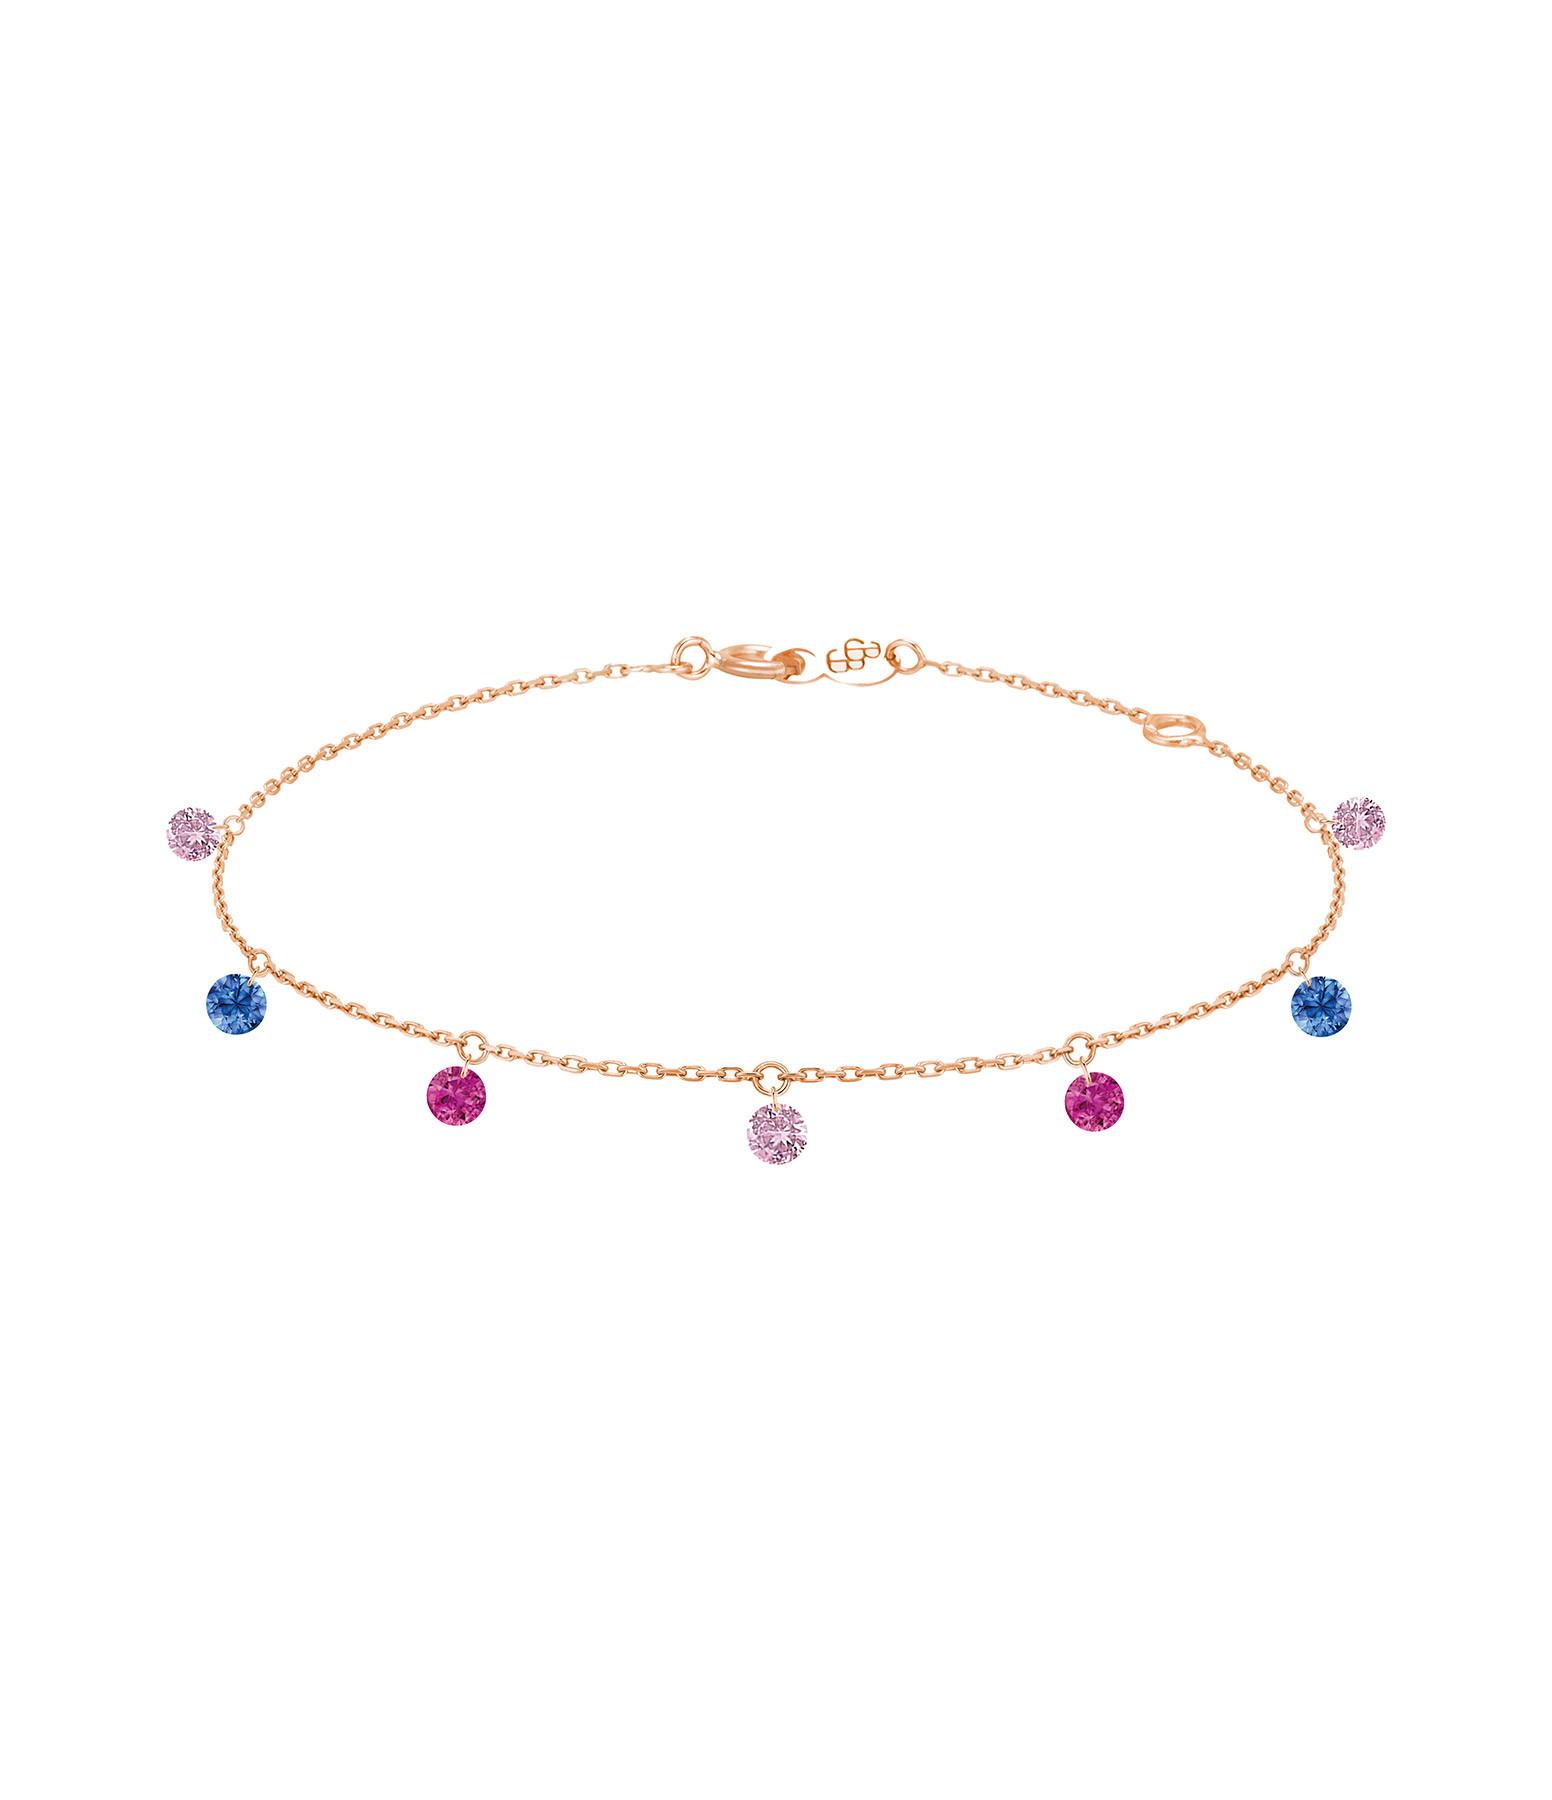 LA BRUNE & LA BLONDE - Bracelet Confetti 7 Venise Rubis Saphirs Or Rose